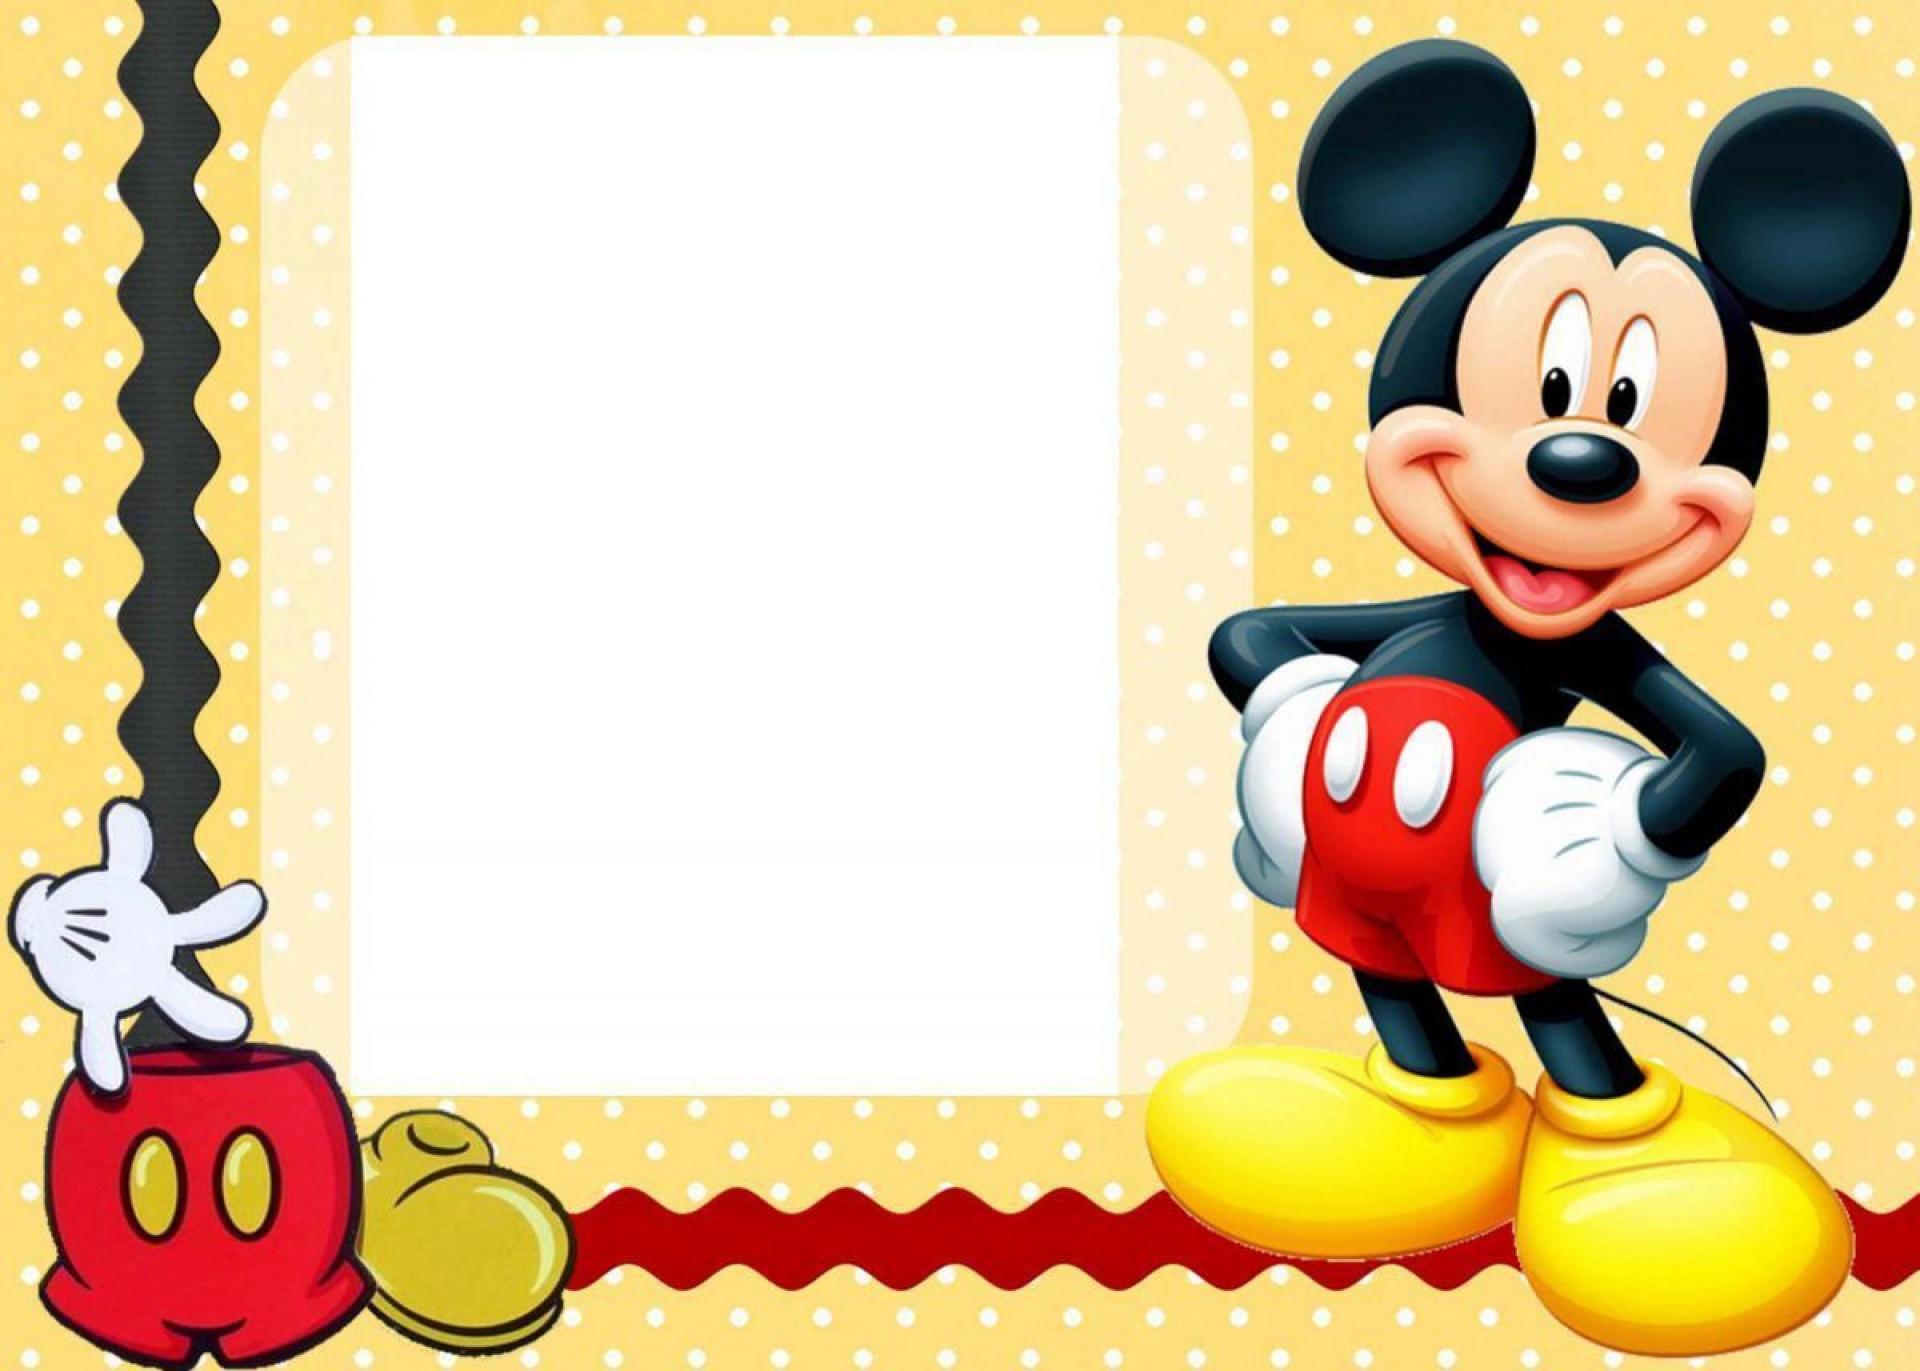 002 Stupendou Free Online Birthday Invitation Card Maker With Photo Inspiration  1st1920